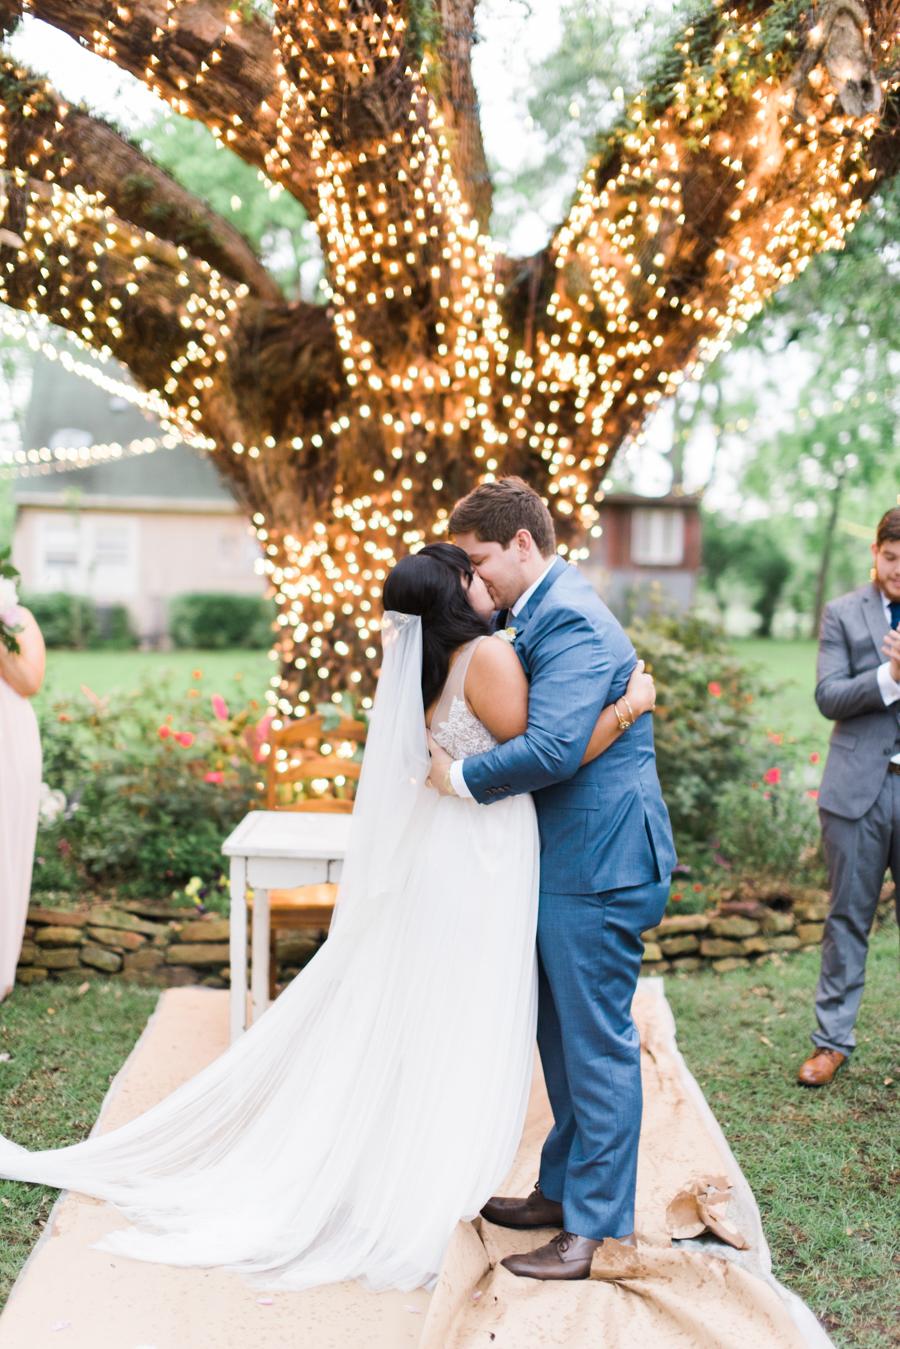 Dana Fernandez Photography Houston Texas Destination Photographer Film Ruffled Blog Wedding Bridal First Look Featured Photography -16.jpg